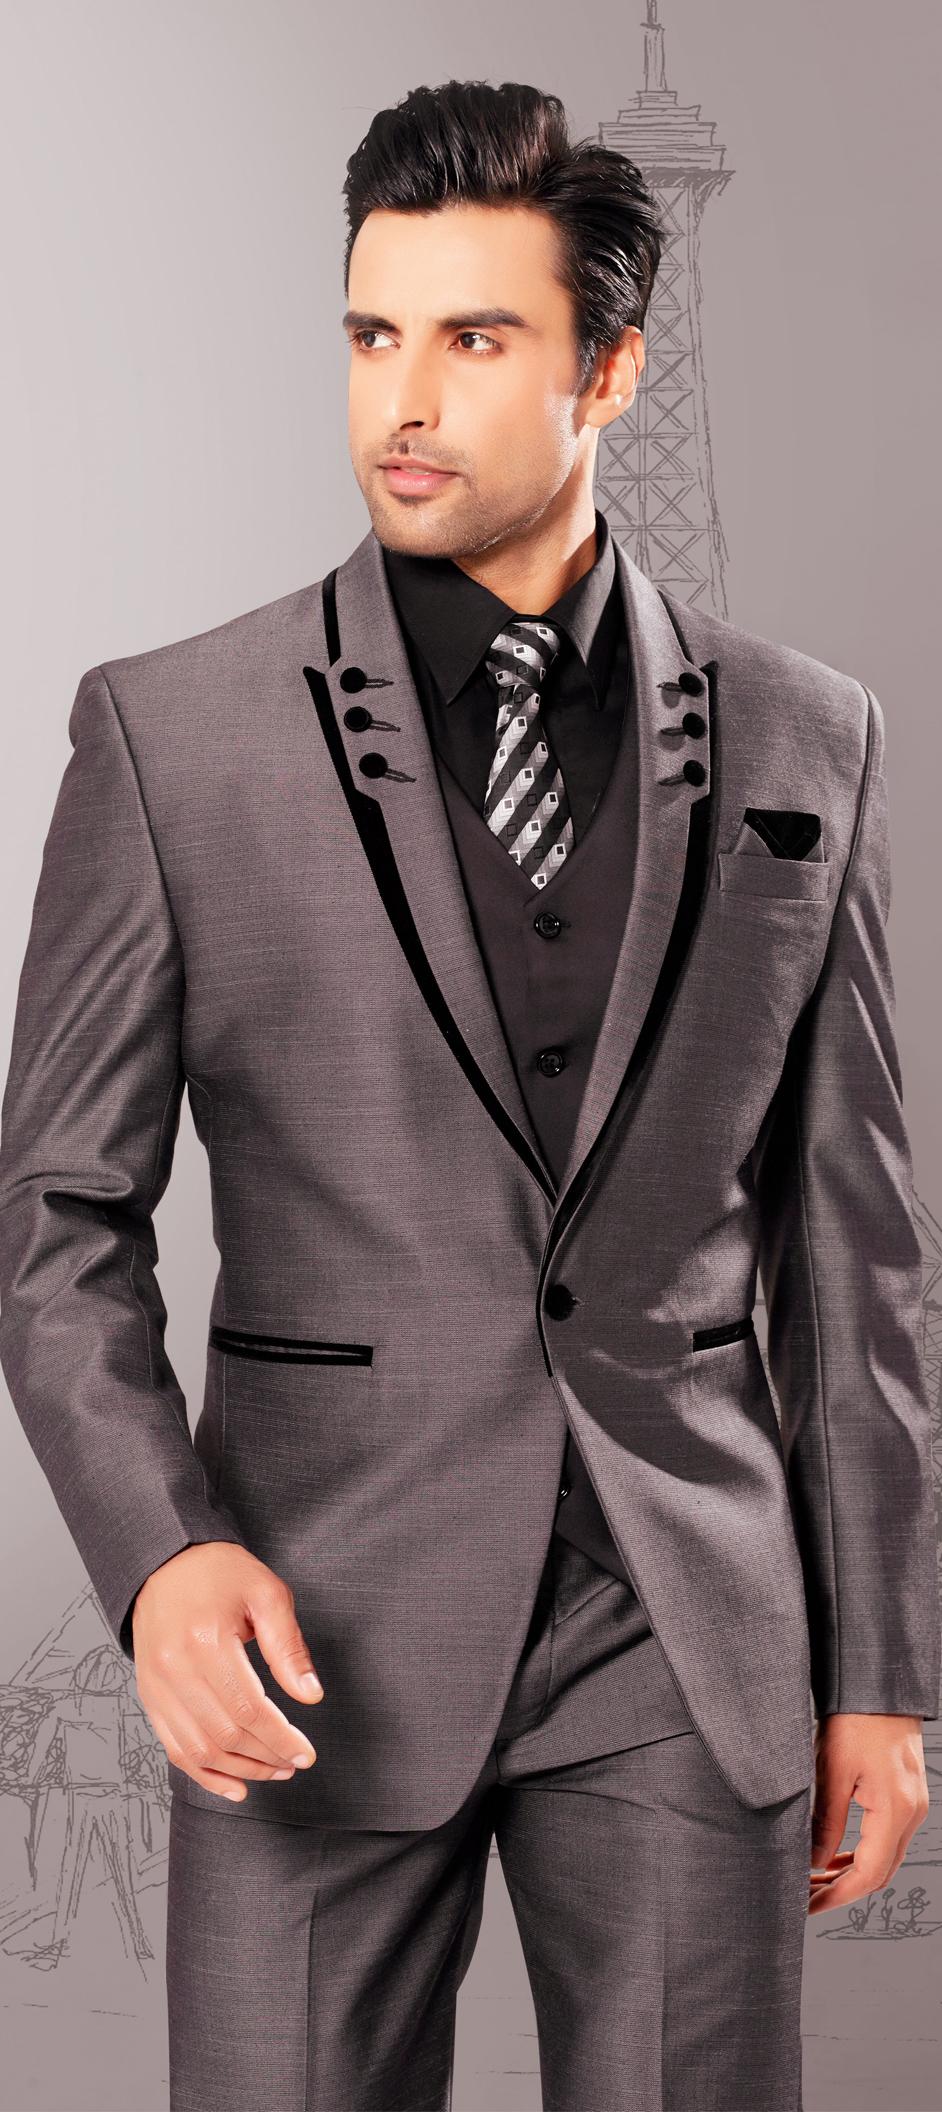 wedding suit for men 500054 qxconla